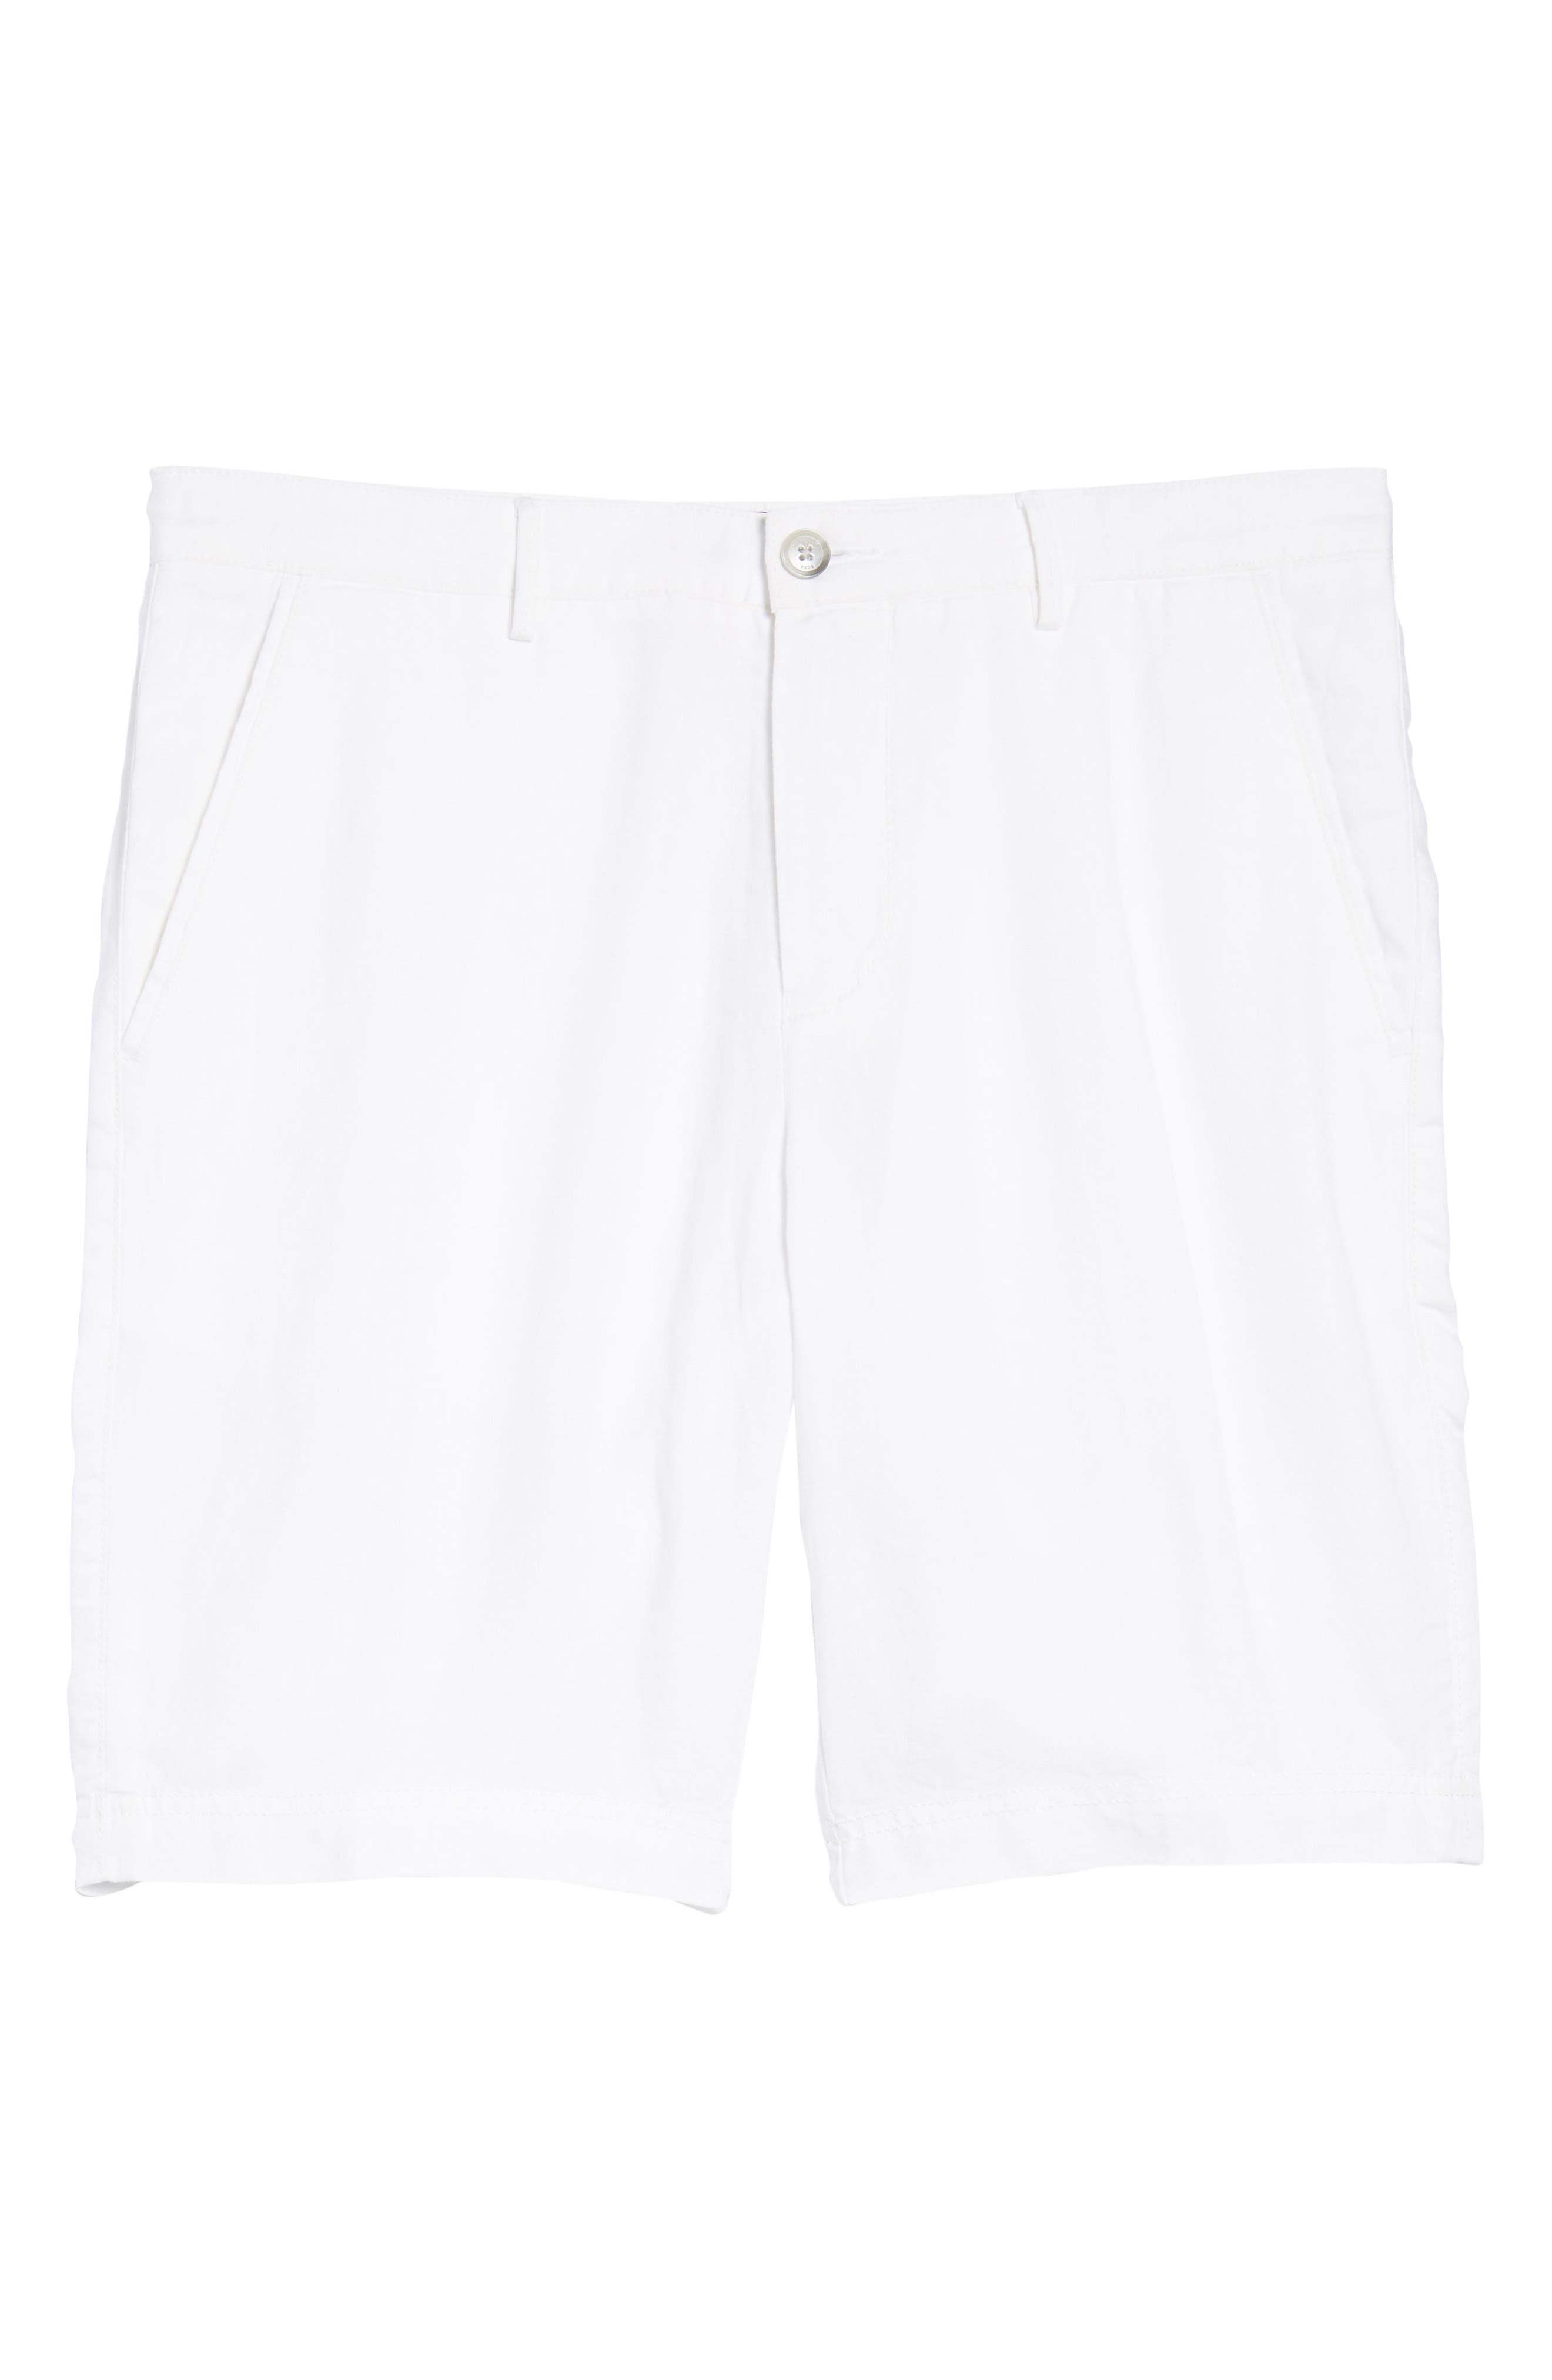 Crigan Linen Shorts,                             Alternate thumbnail 28, color,